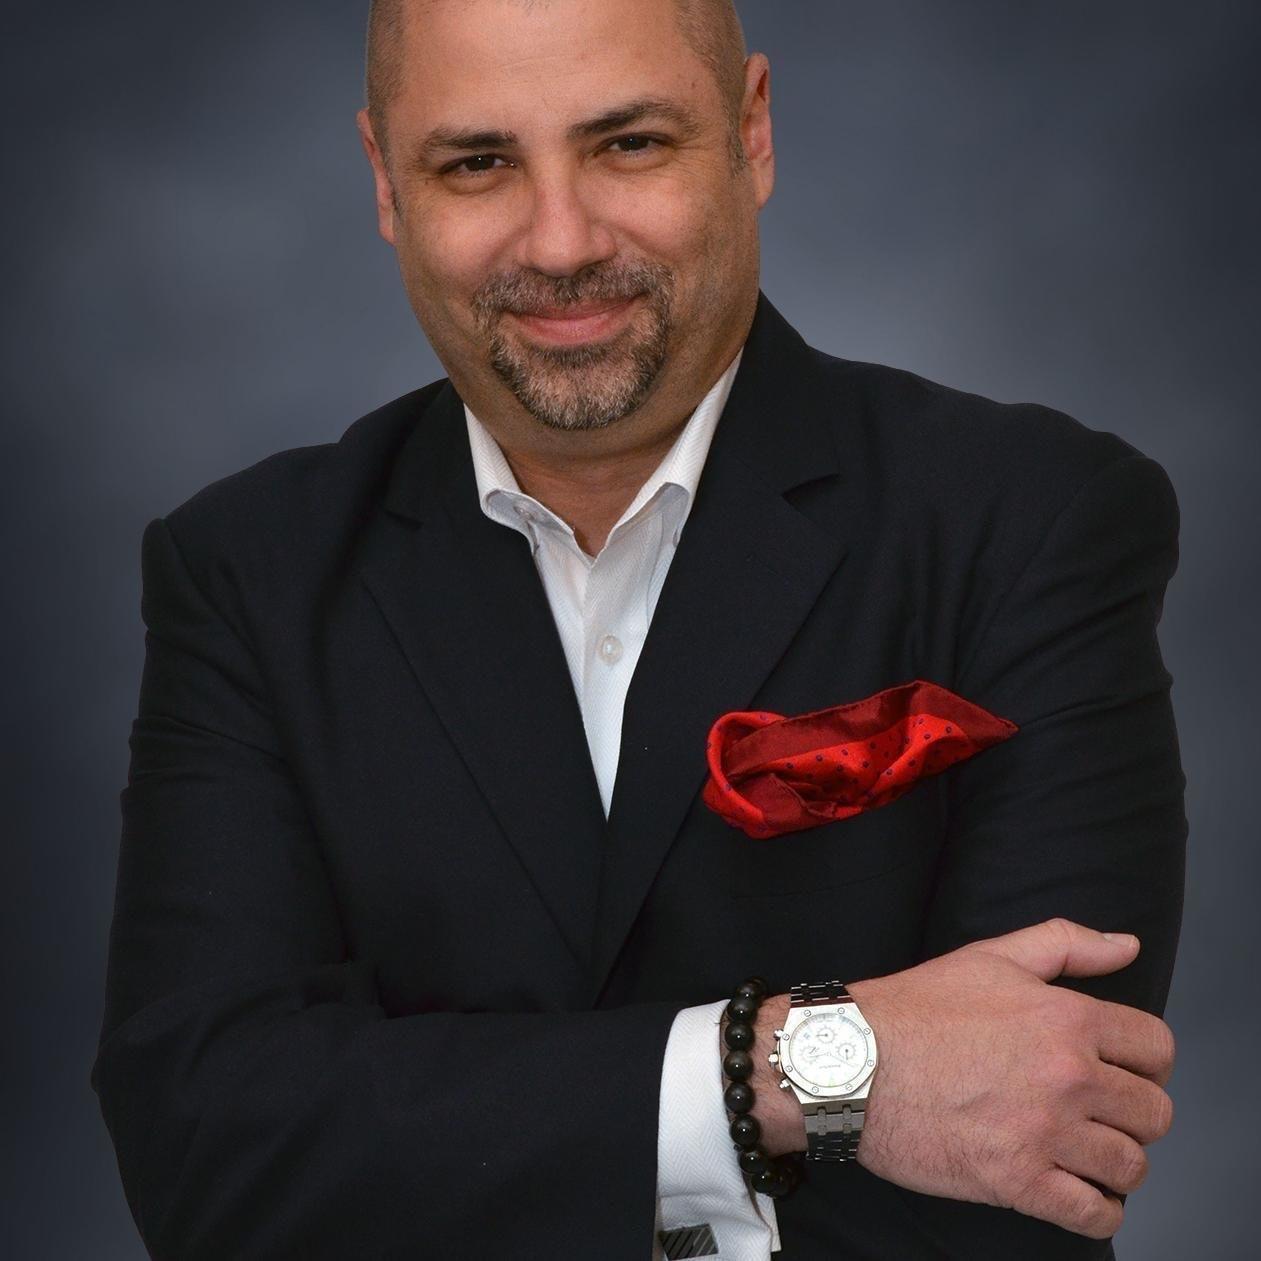 Brian Kraman